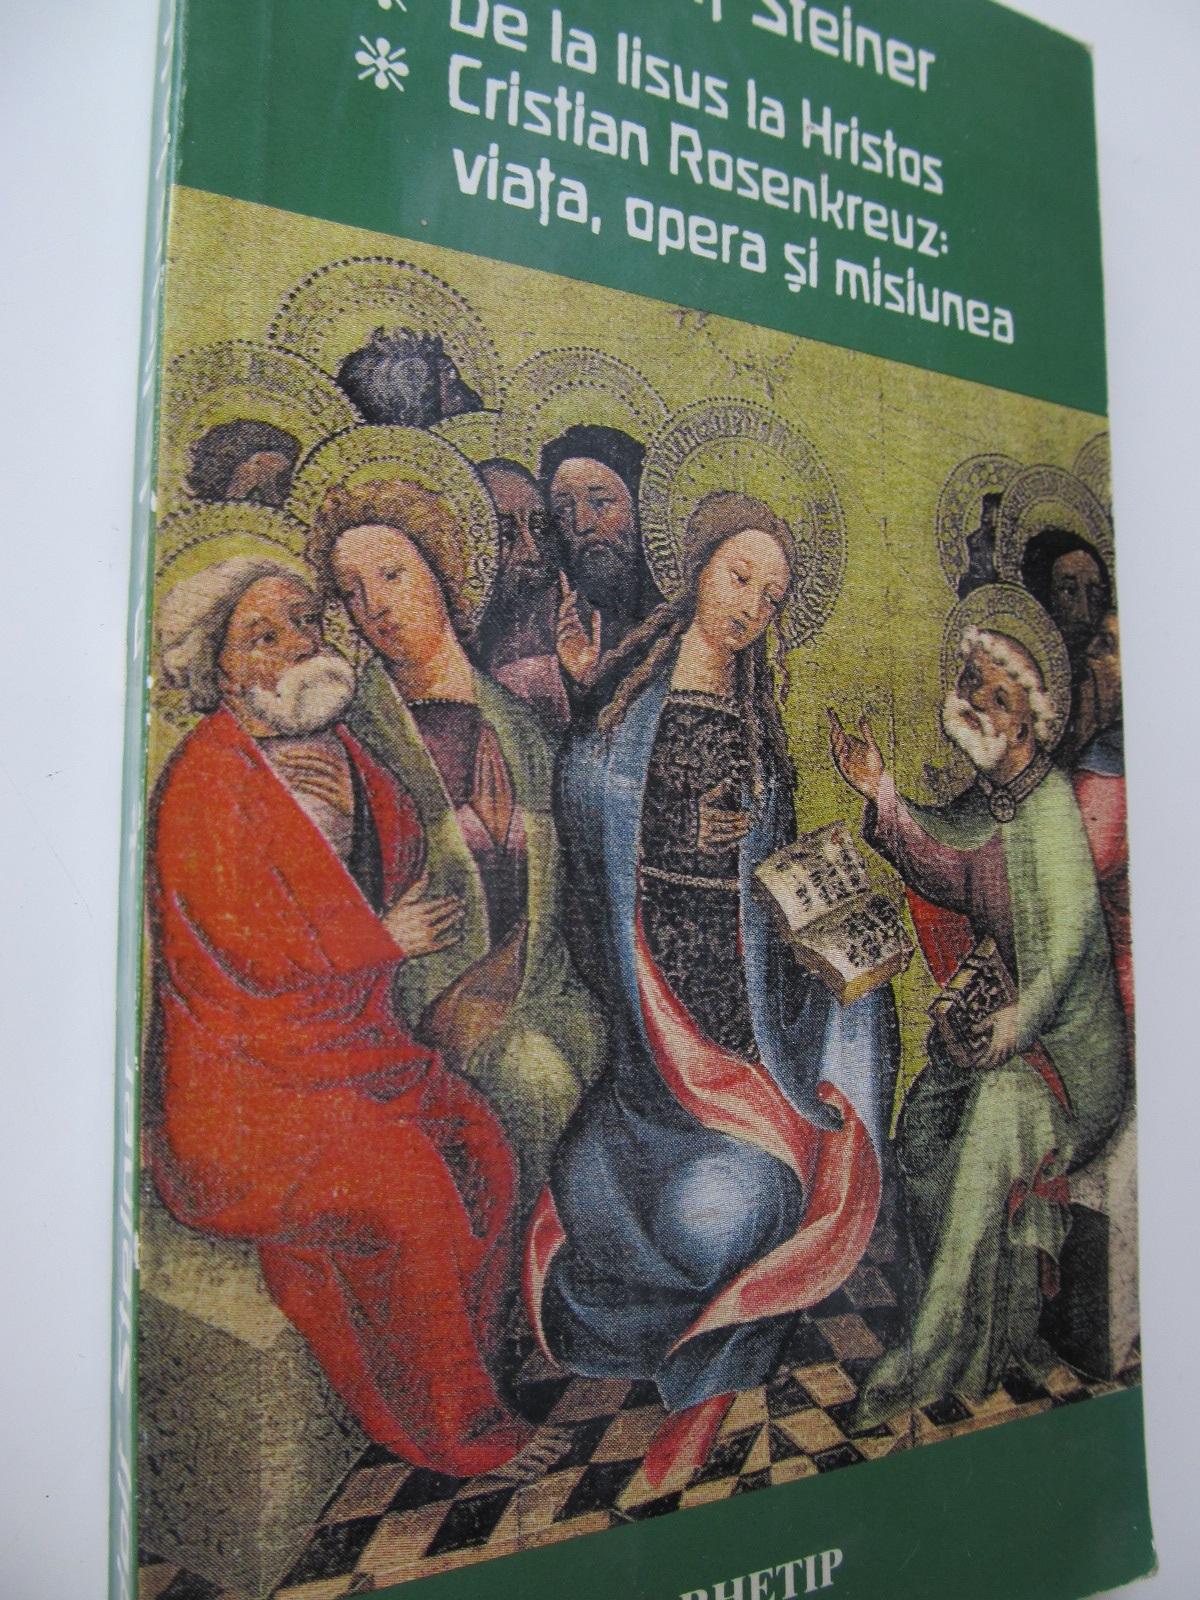 De la Iisus la Hristos - Cristian Rosenkreutz viata opera si misiunea - Rudolf Steiner | Detalii carte